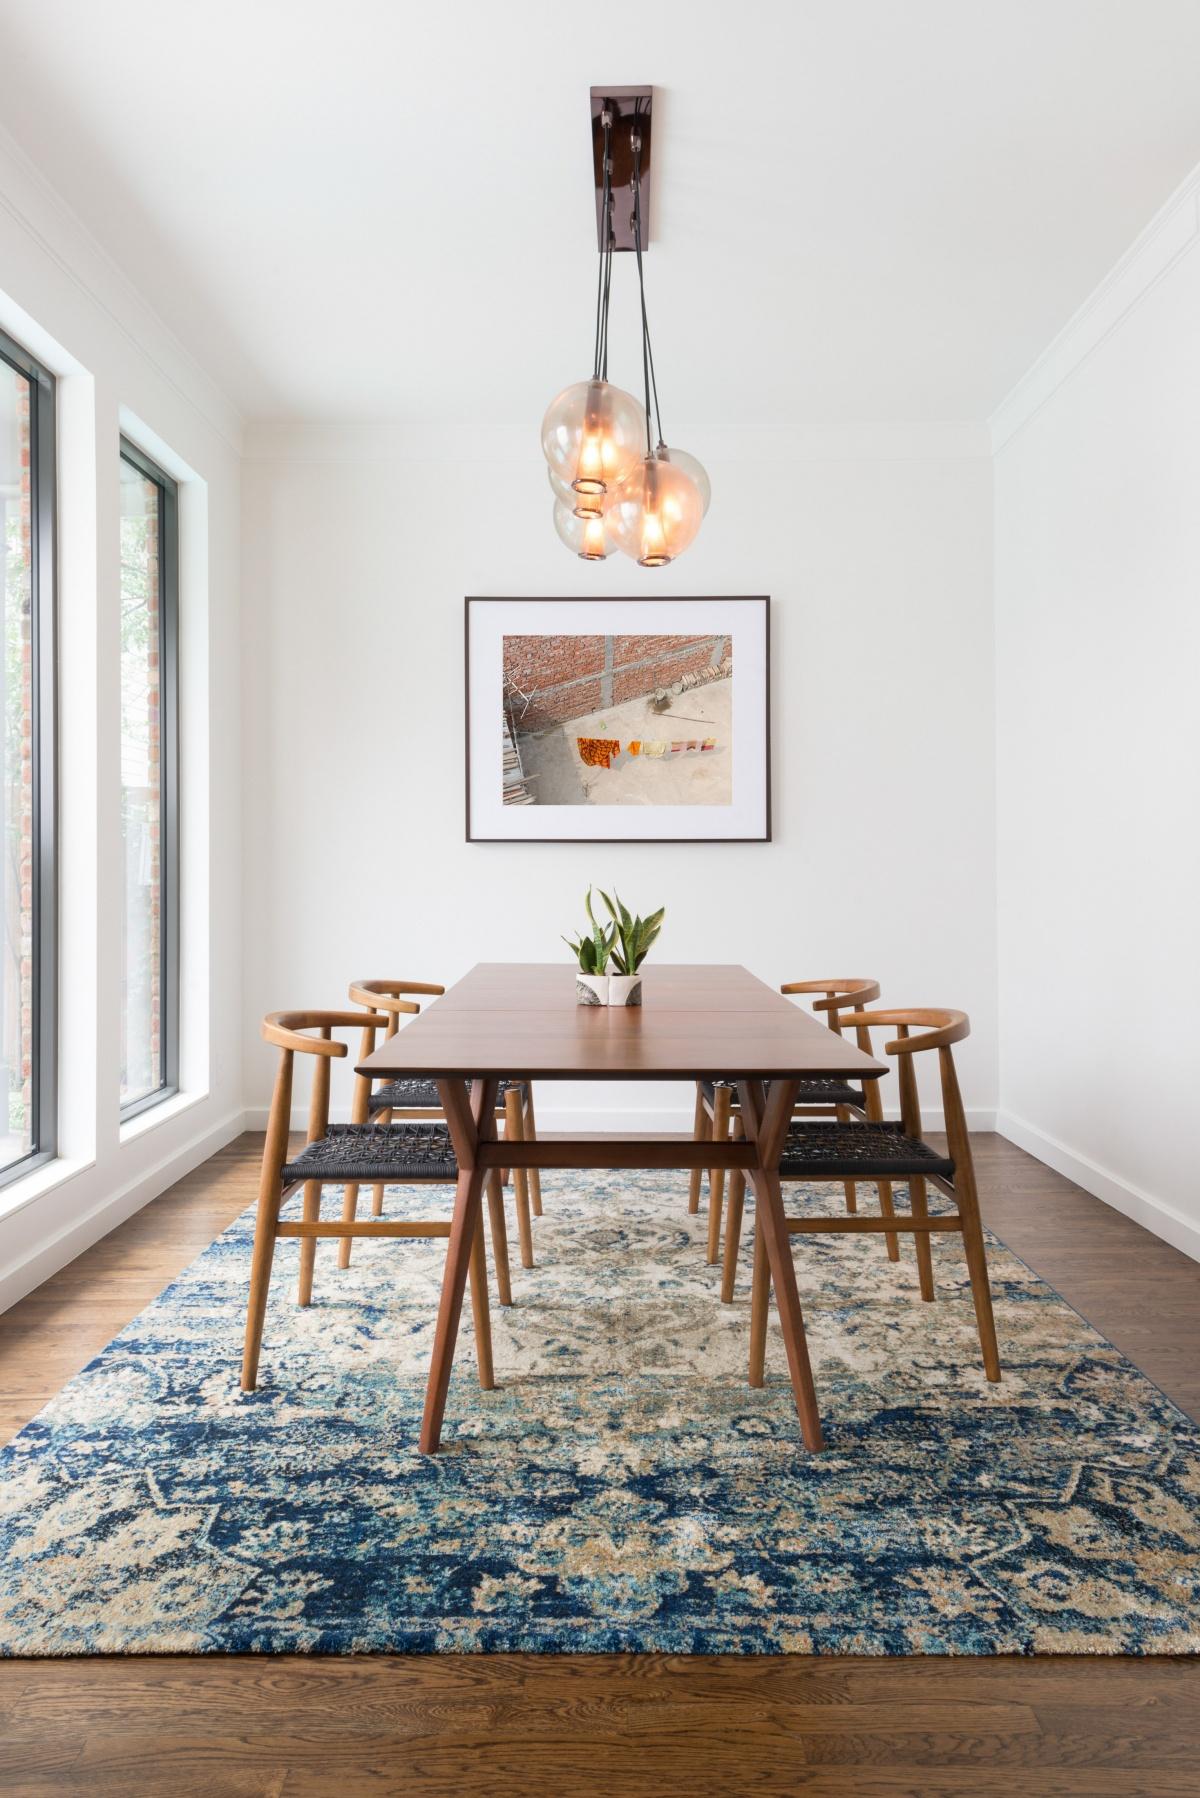 bohemian-scandinavian dining room with statement lights